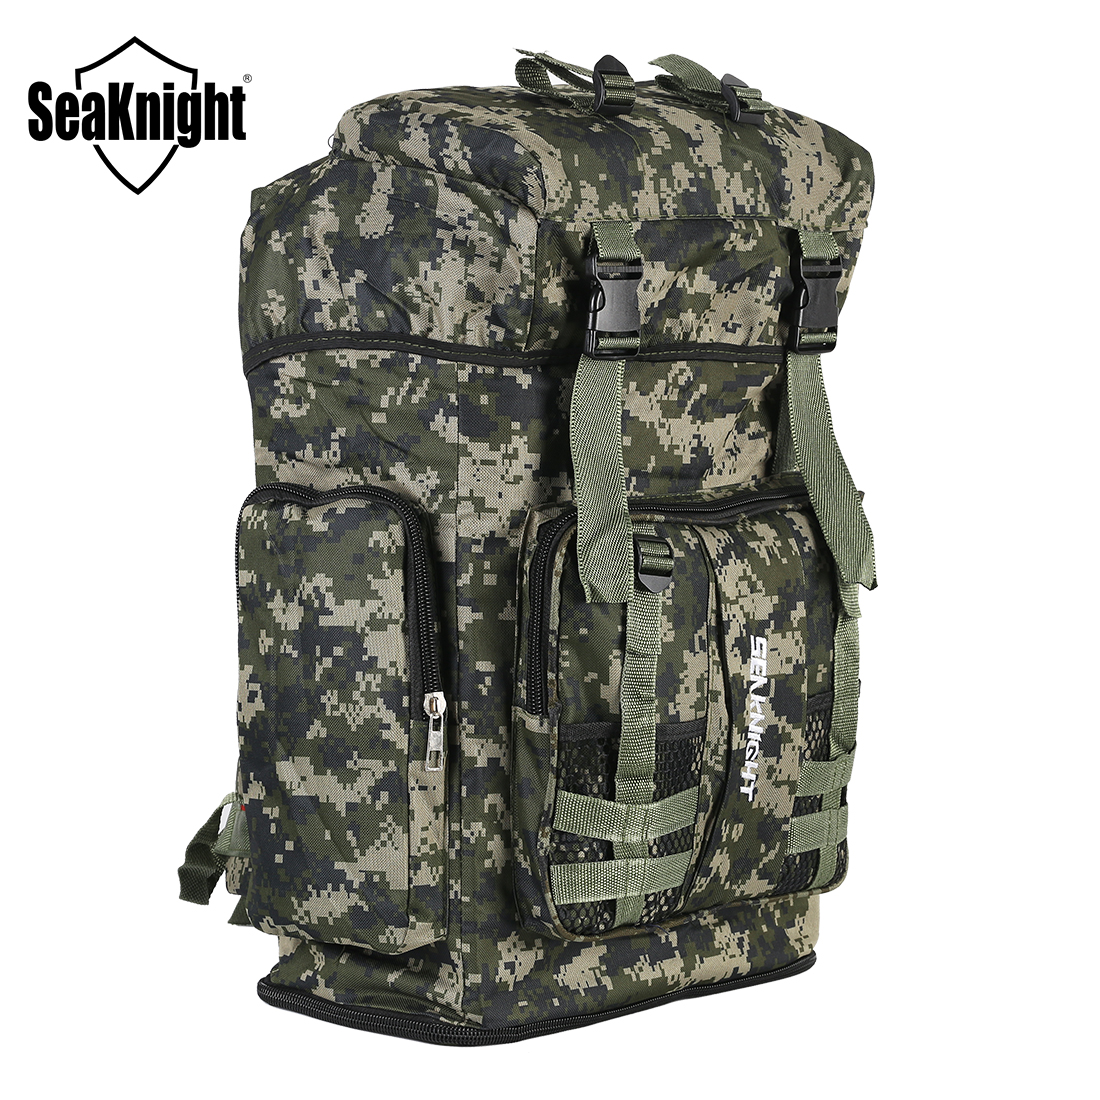 SeaKnight SK008 70L Large Capacity Multipurpose Backpack For Outdoor Sport Camping Hiking Waterproof Fishing Bag 36*64*17cm